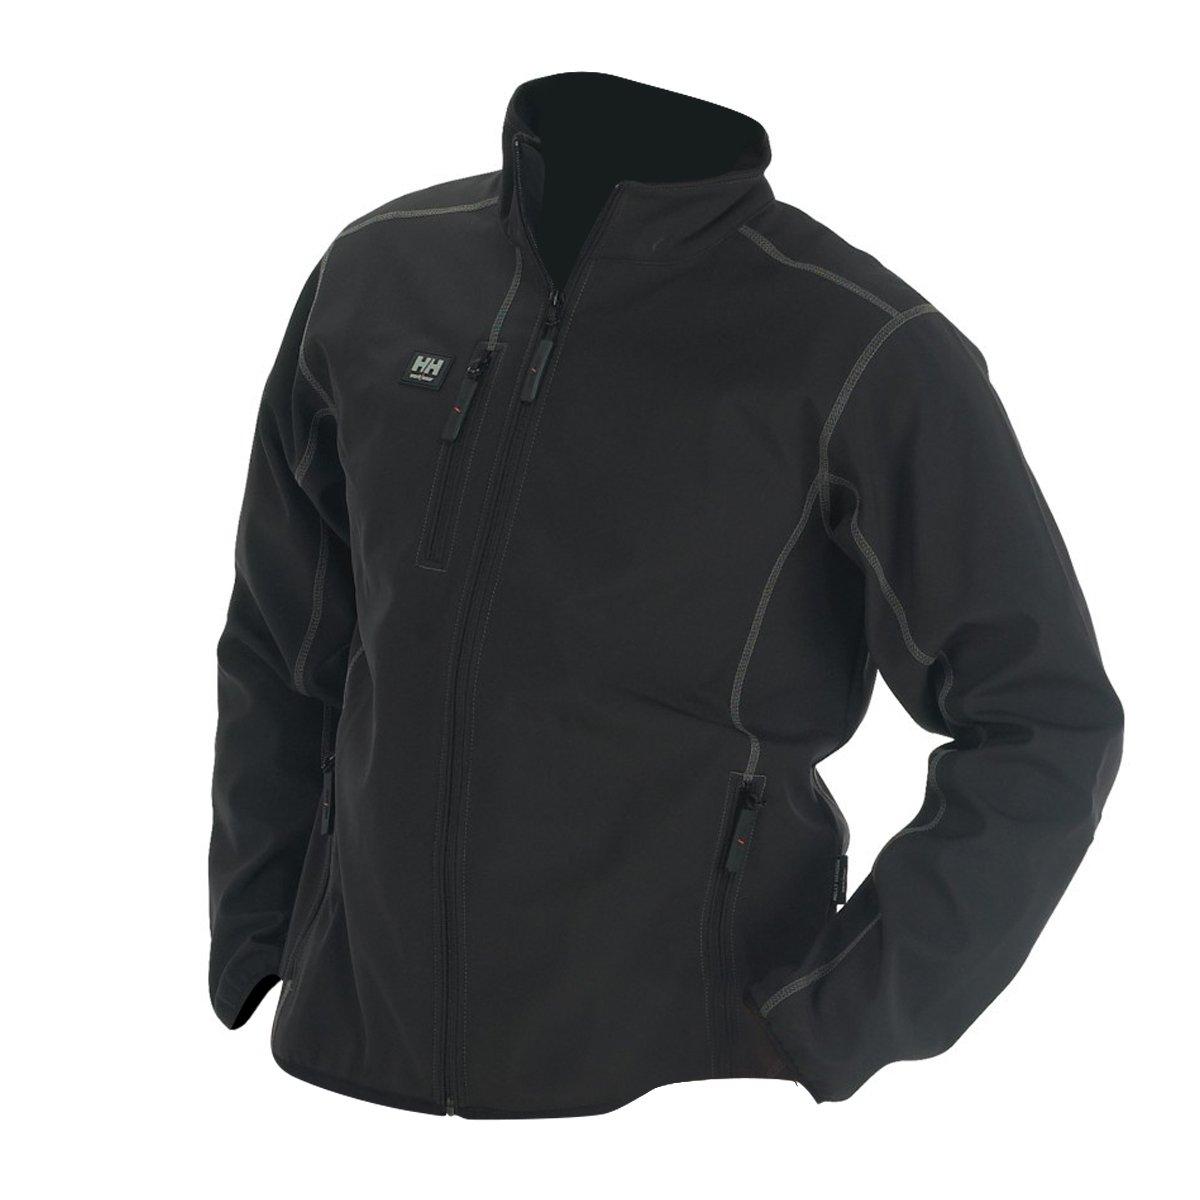 helly hansen 74002 mens workwear madrid softshell fleece jacket coat size s 2xl ebay. Black Bedroom Furniture Sets. Home Design Ideas